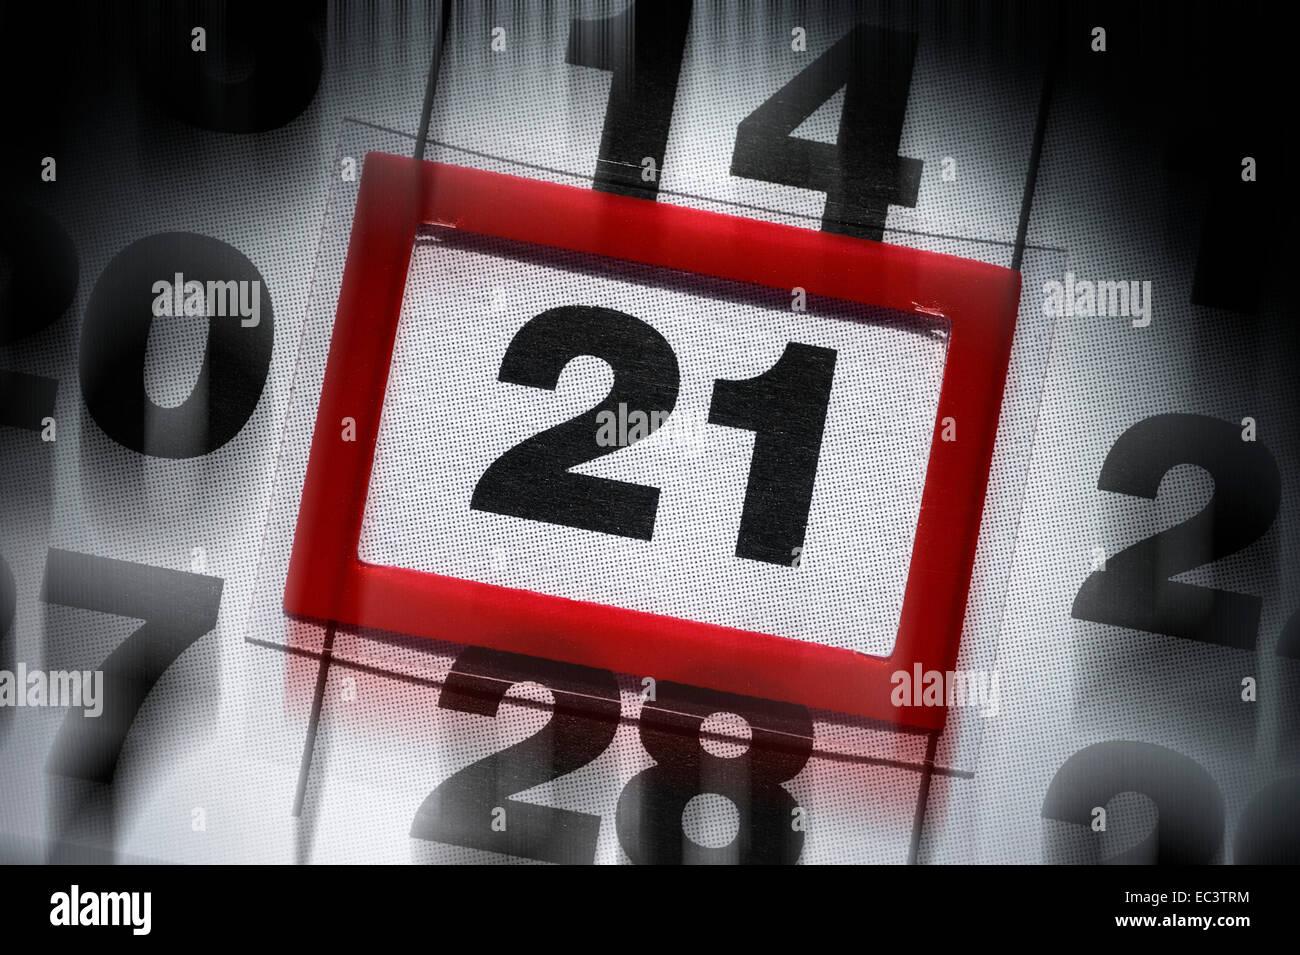 Calendar sheet showing date December 21st, 2012, end of the world - Stock Image